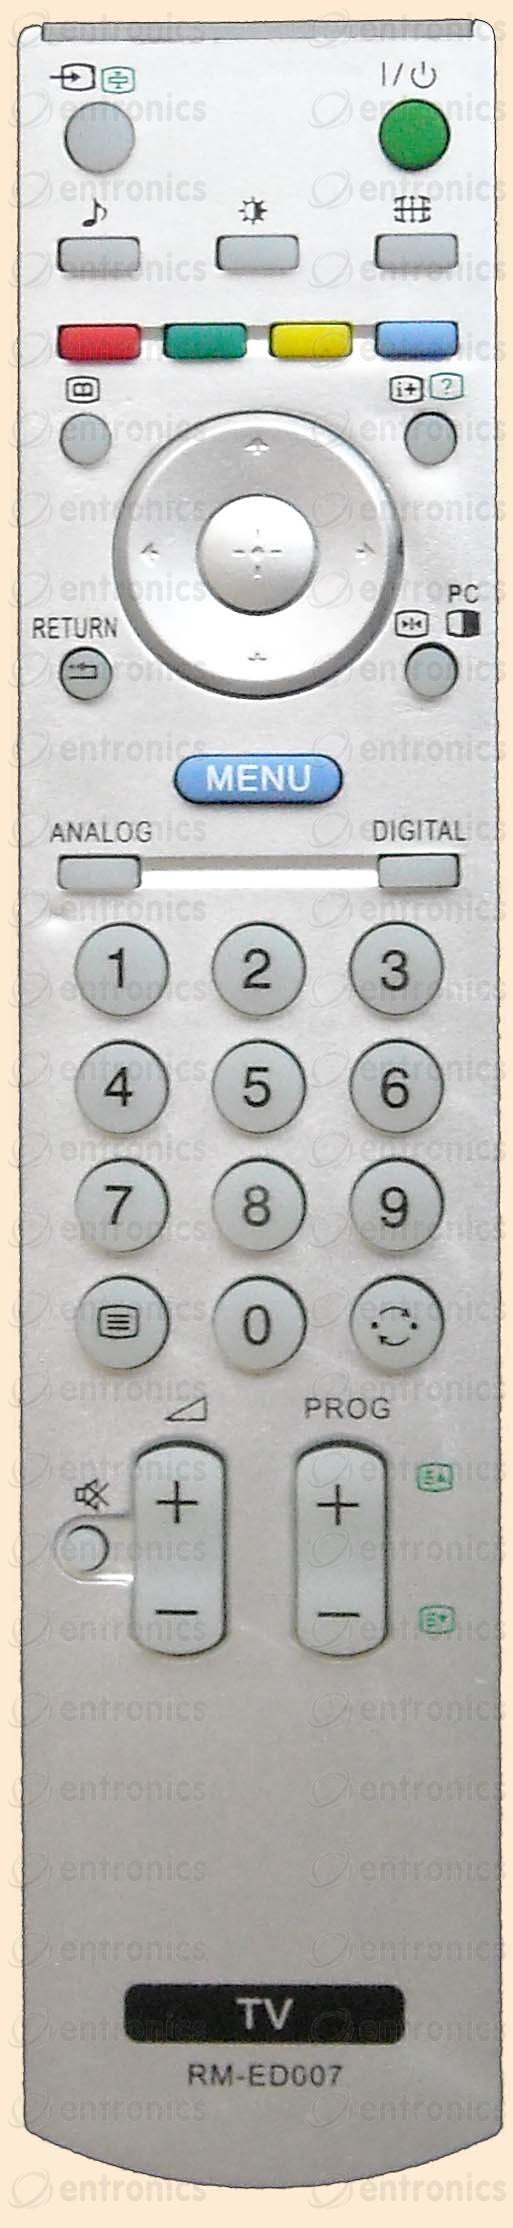 Дистанционно управление SONY RM-ED007